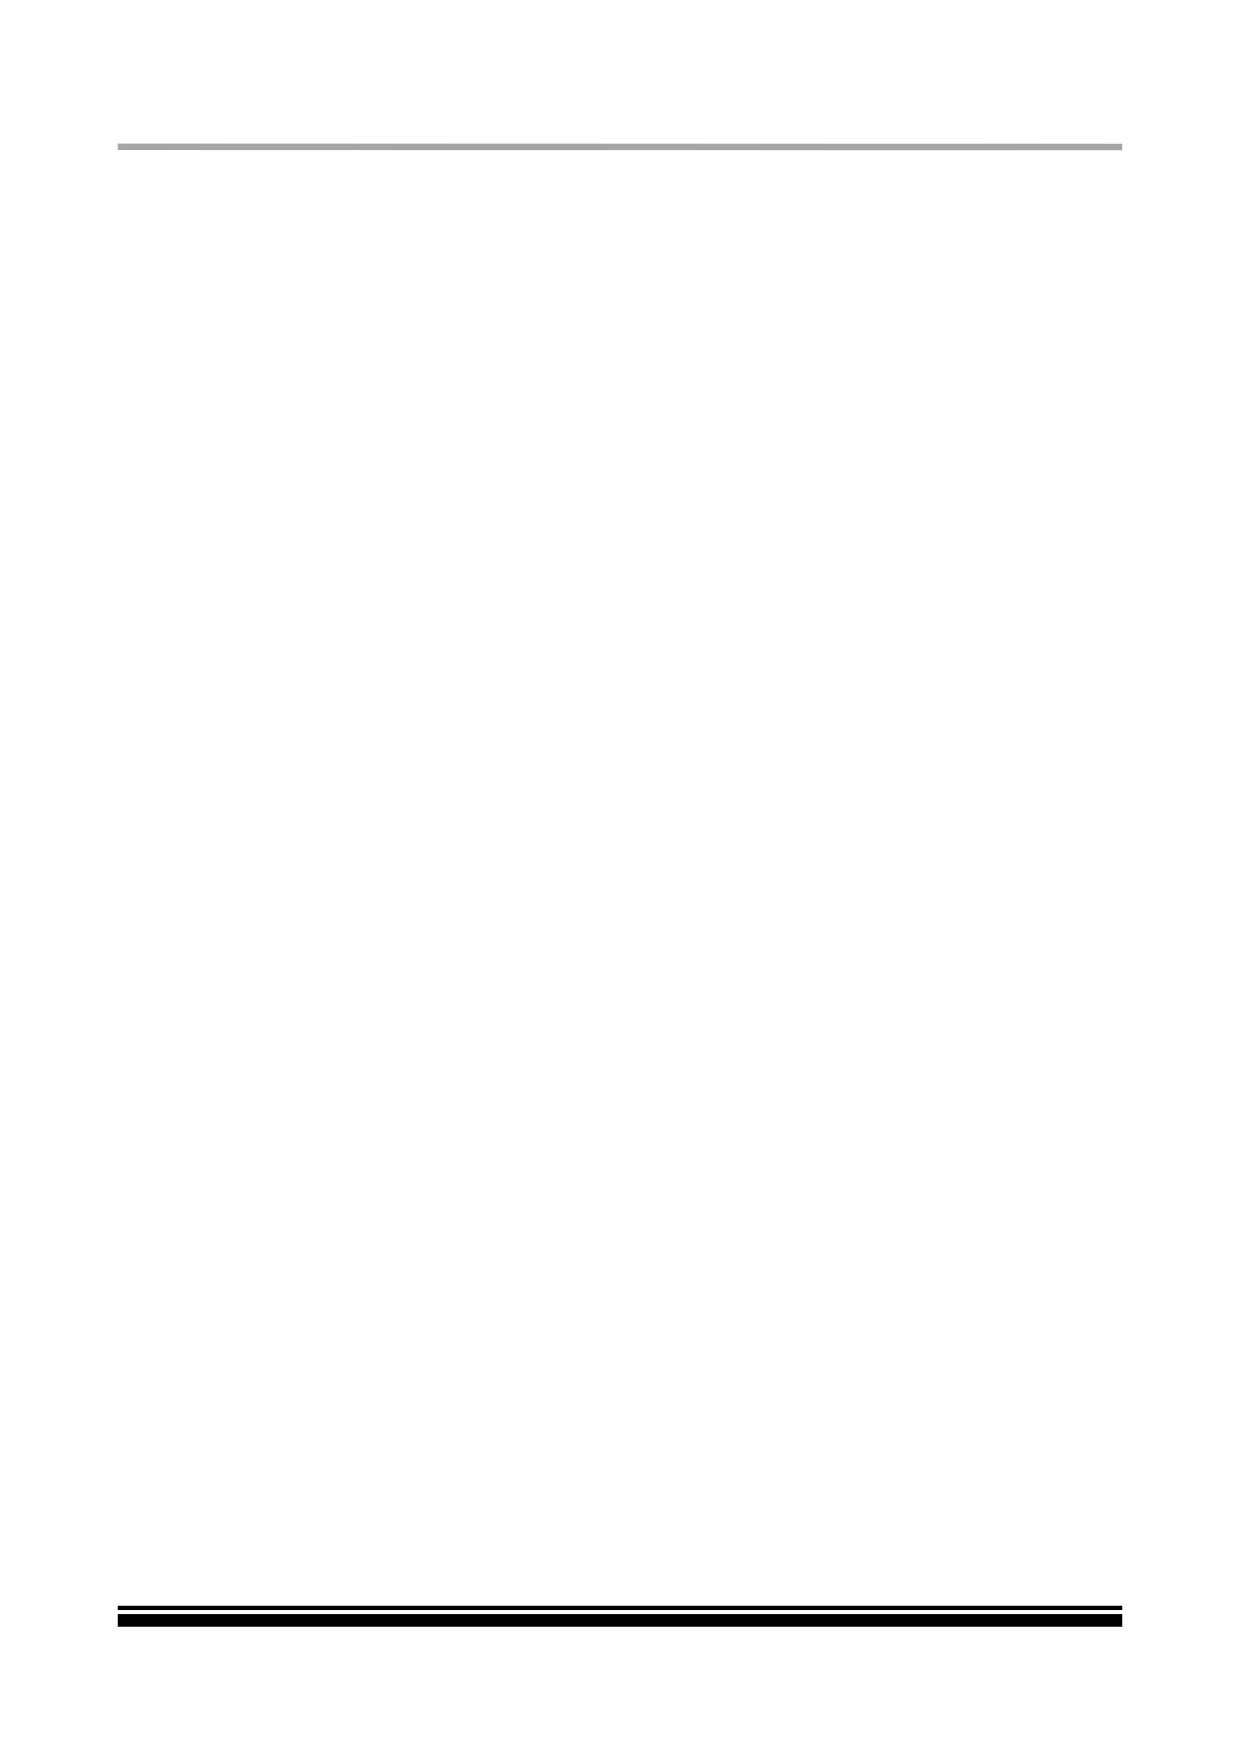 I1101-6TJN0906C Даташит, Описание, Даташиты